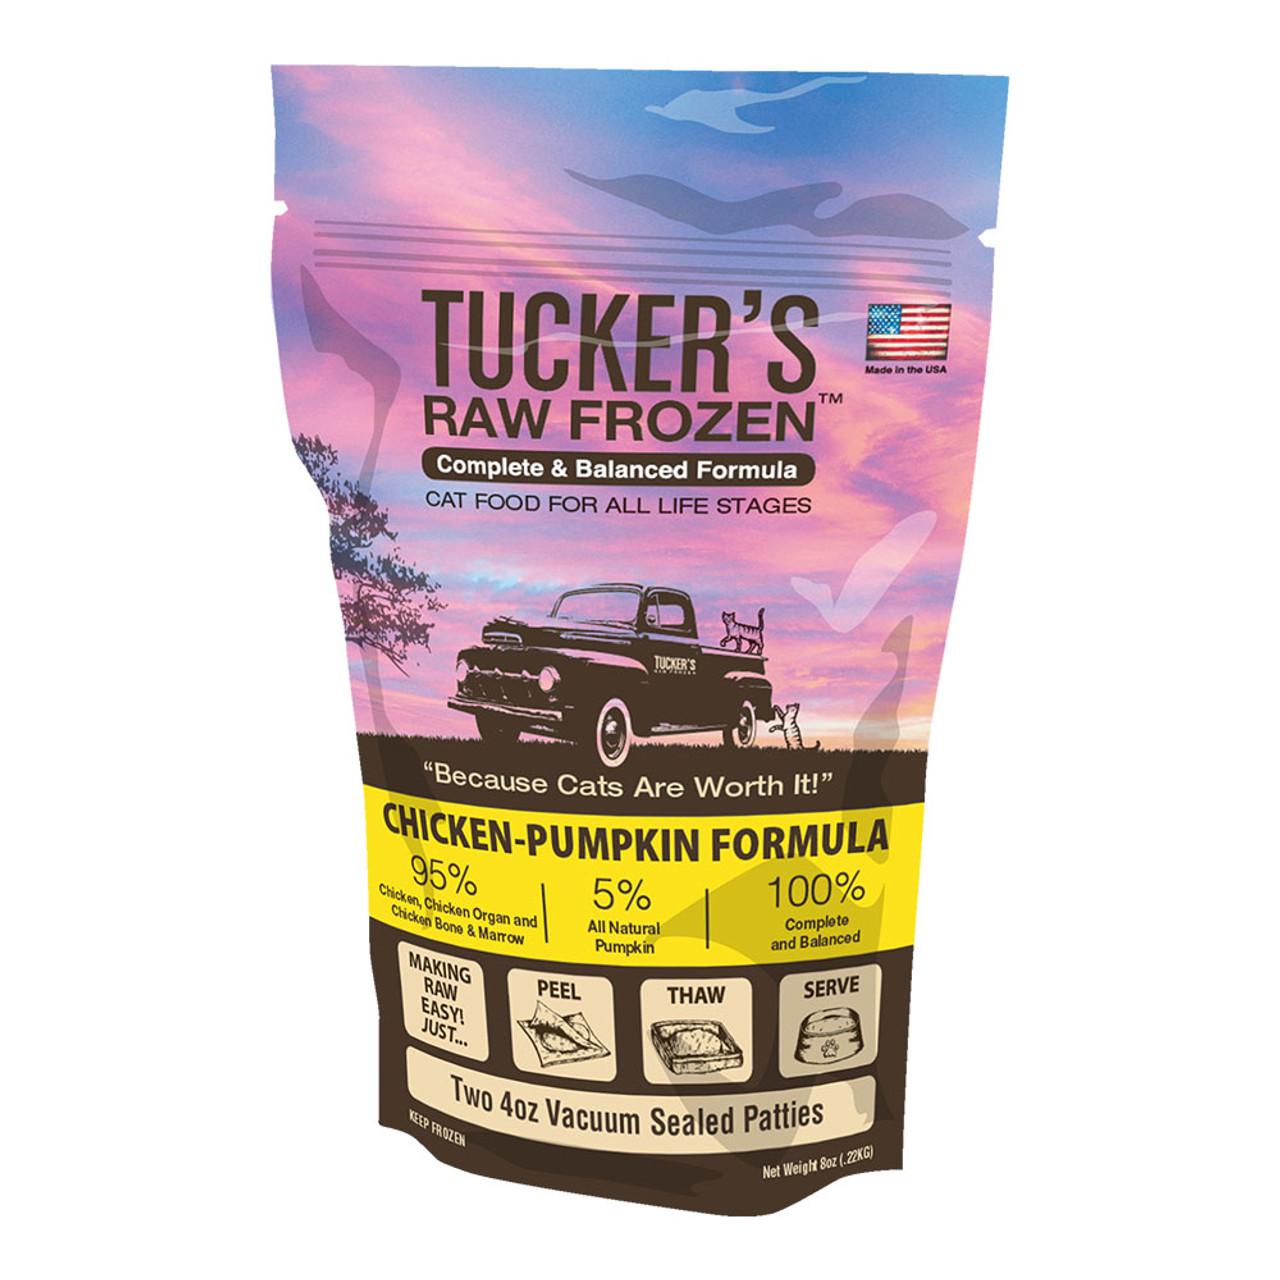 Tucker's Raw Frozen Chicken-Pumpkin Diet Cat Food